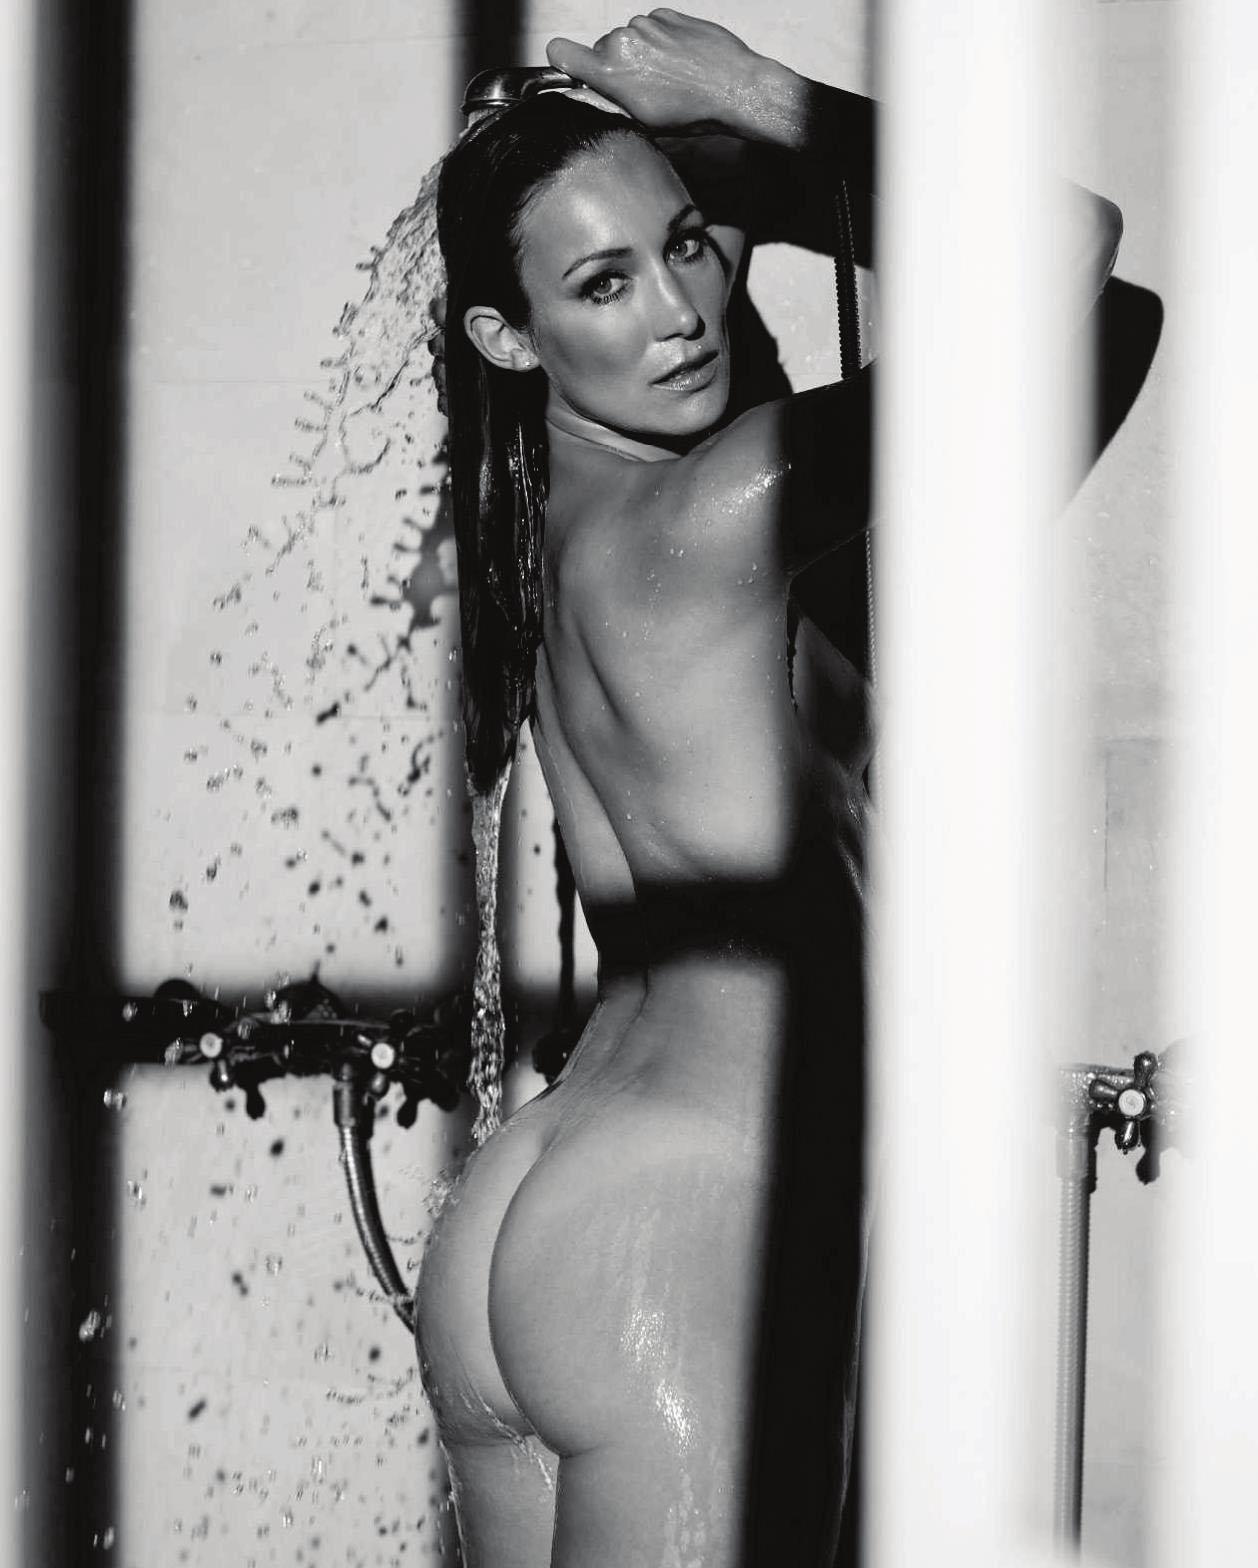 Кристин Тэйсс голая. Фото - 19